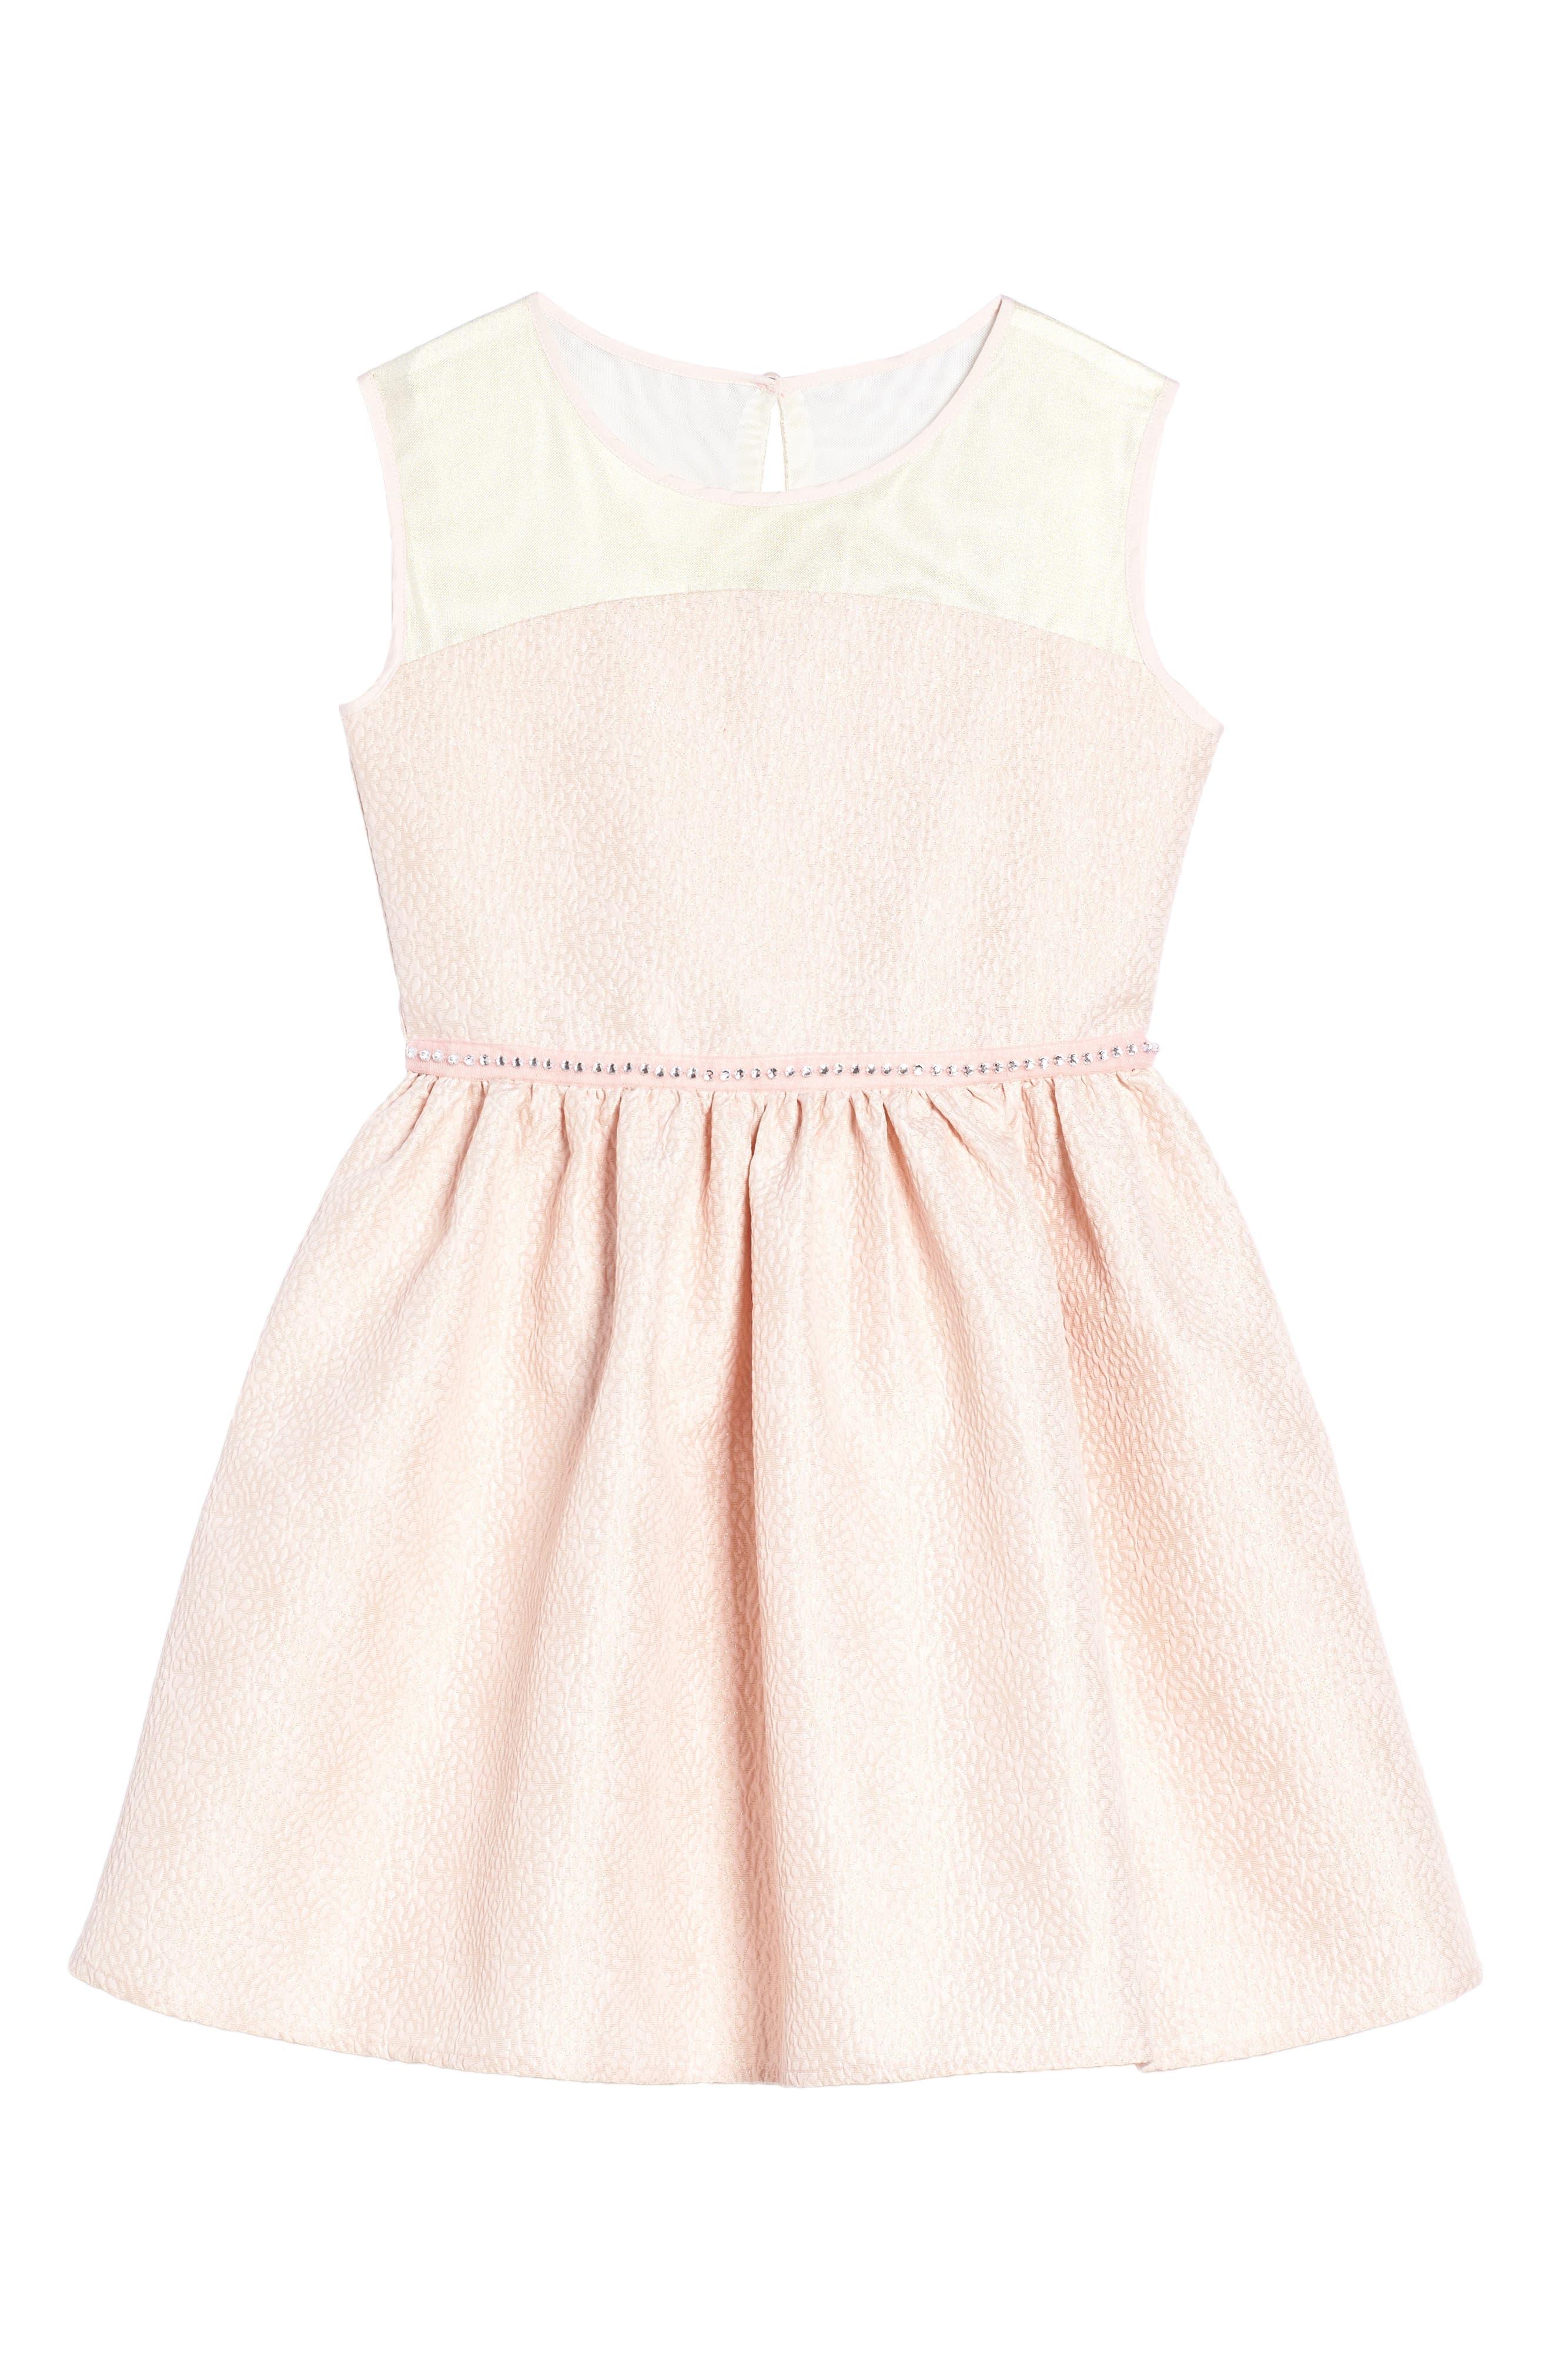 Main Image - BLUSH by Us Angels Fit & Flare Dress (Big Girls)